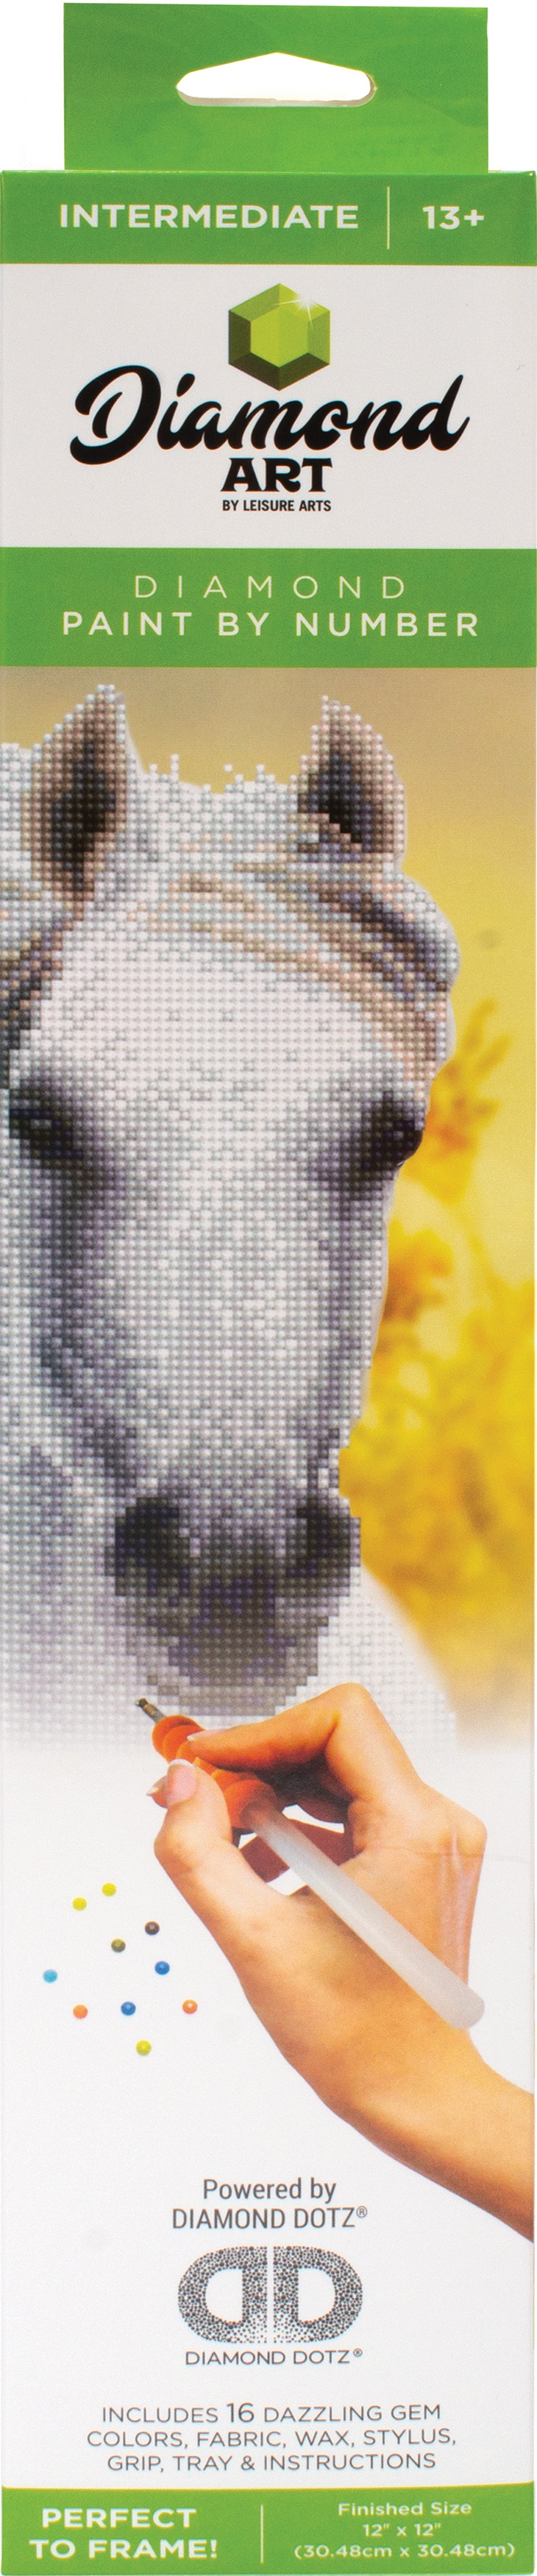 Diamond Art Kit 12x12 Intermediate White Horse